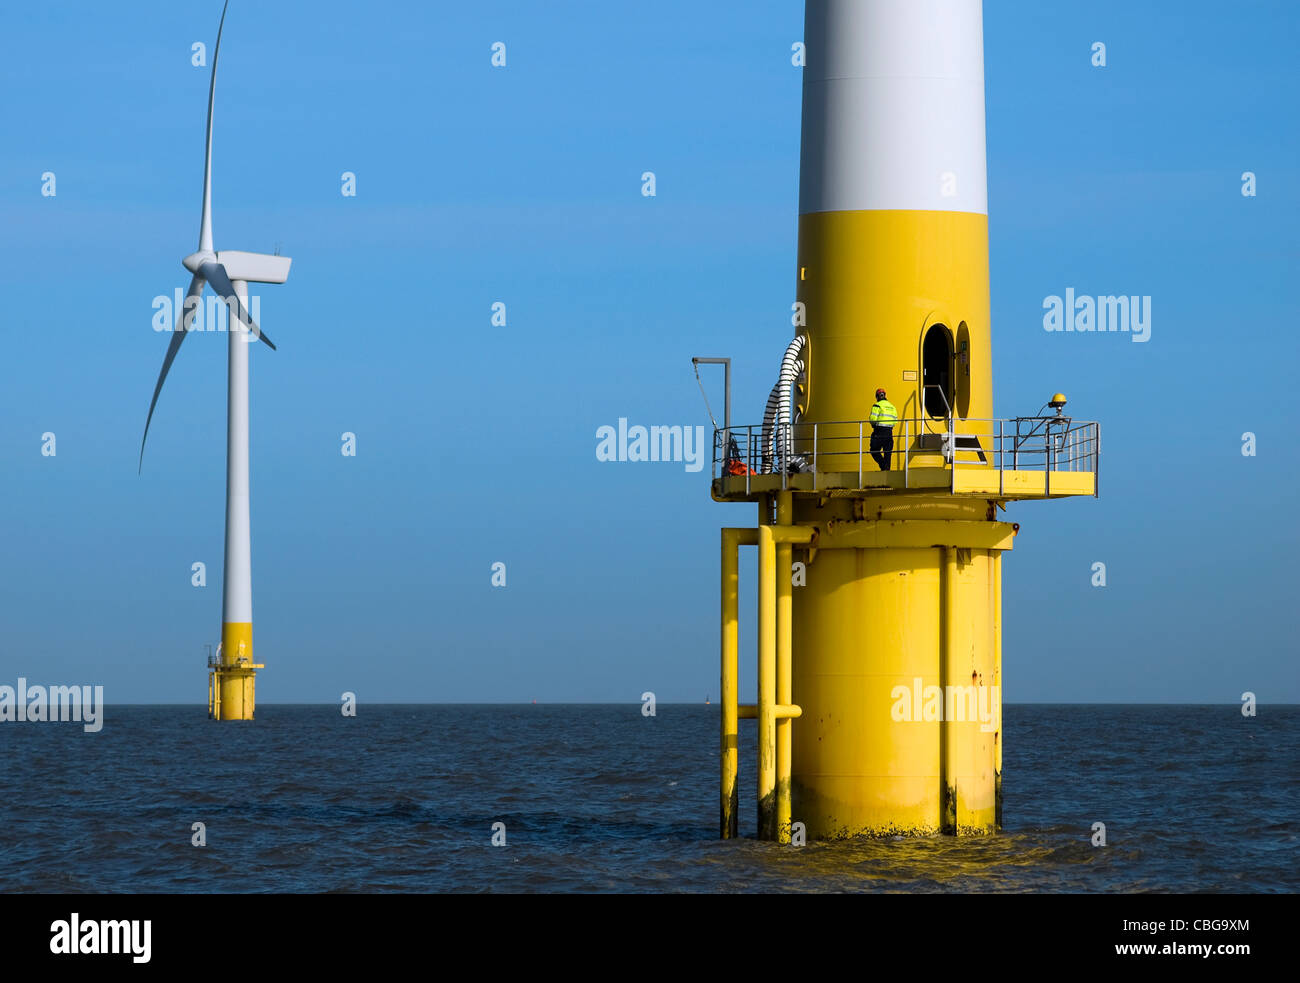 Scroby Sands Wind Farm, Great Yarmouth, Norfolk Stockbild